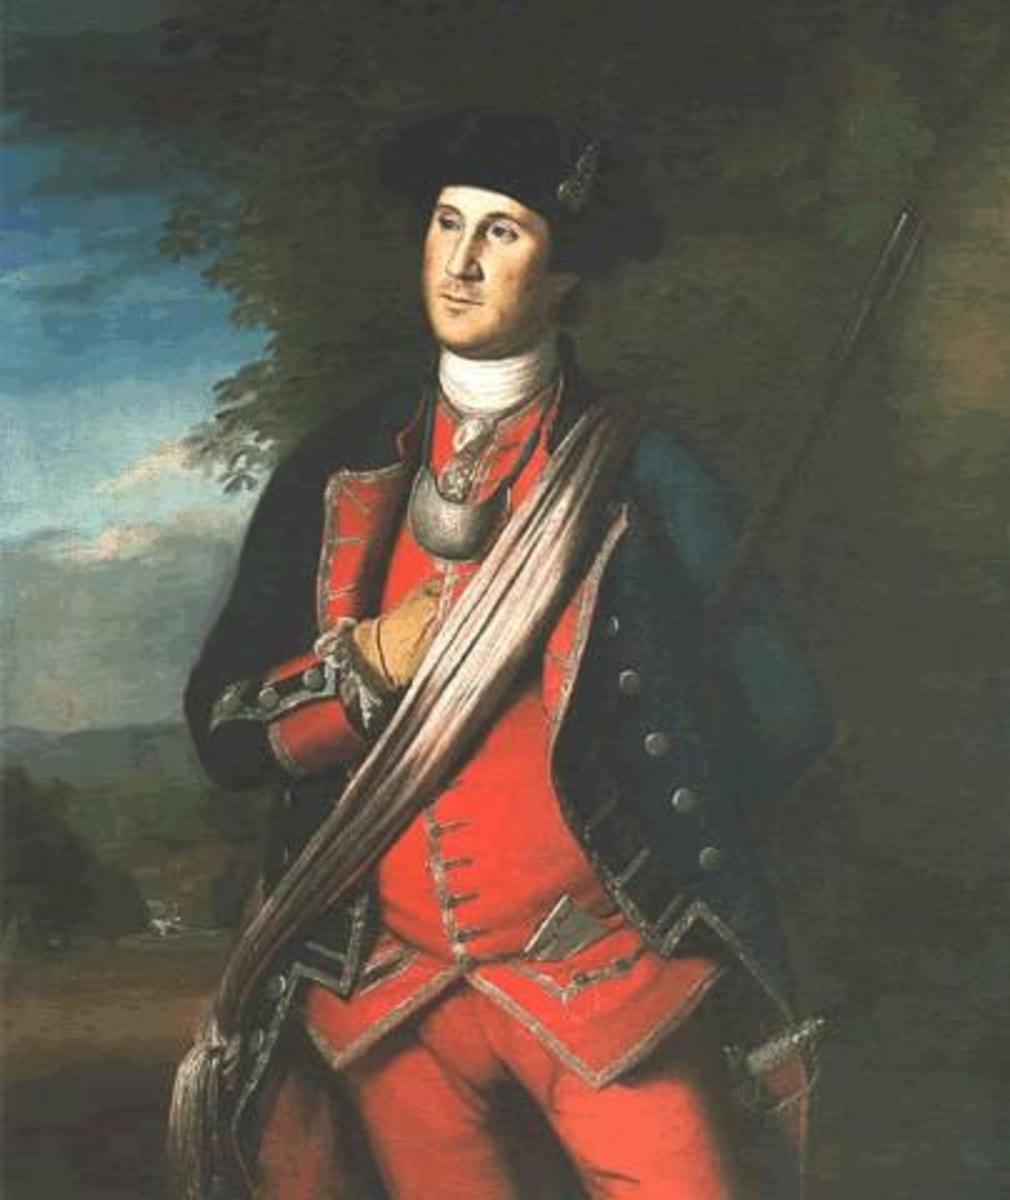 Washington and Caesar - A Book Review